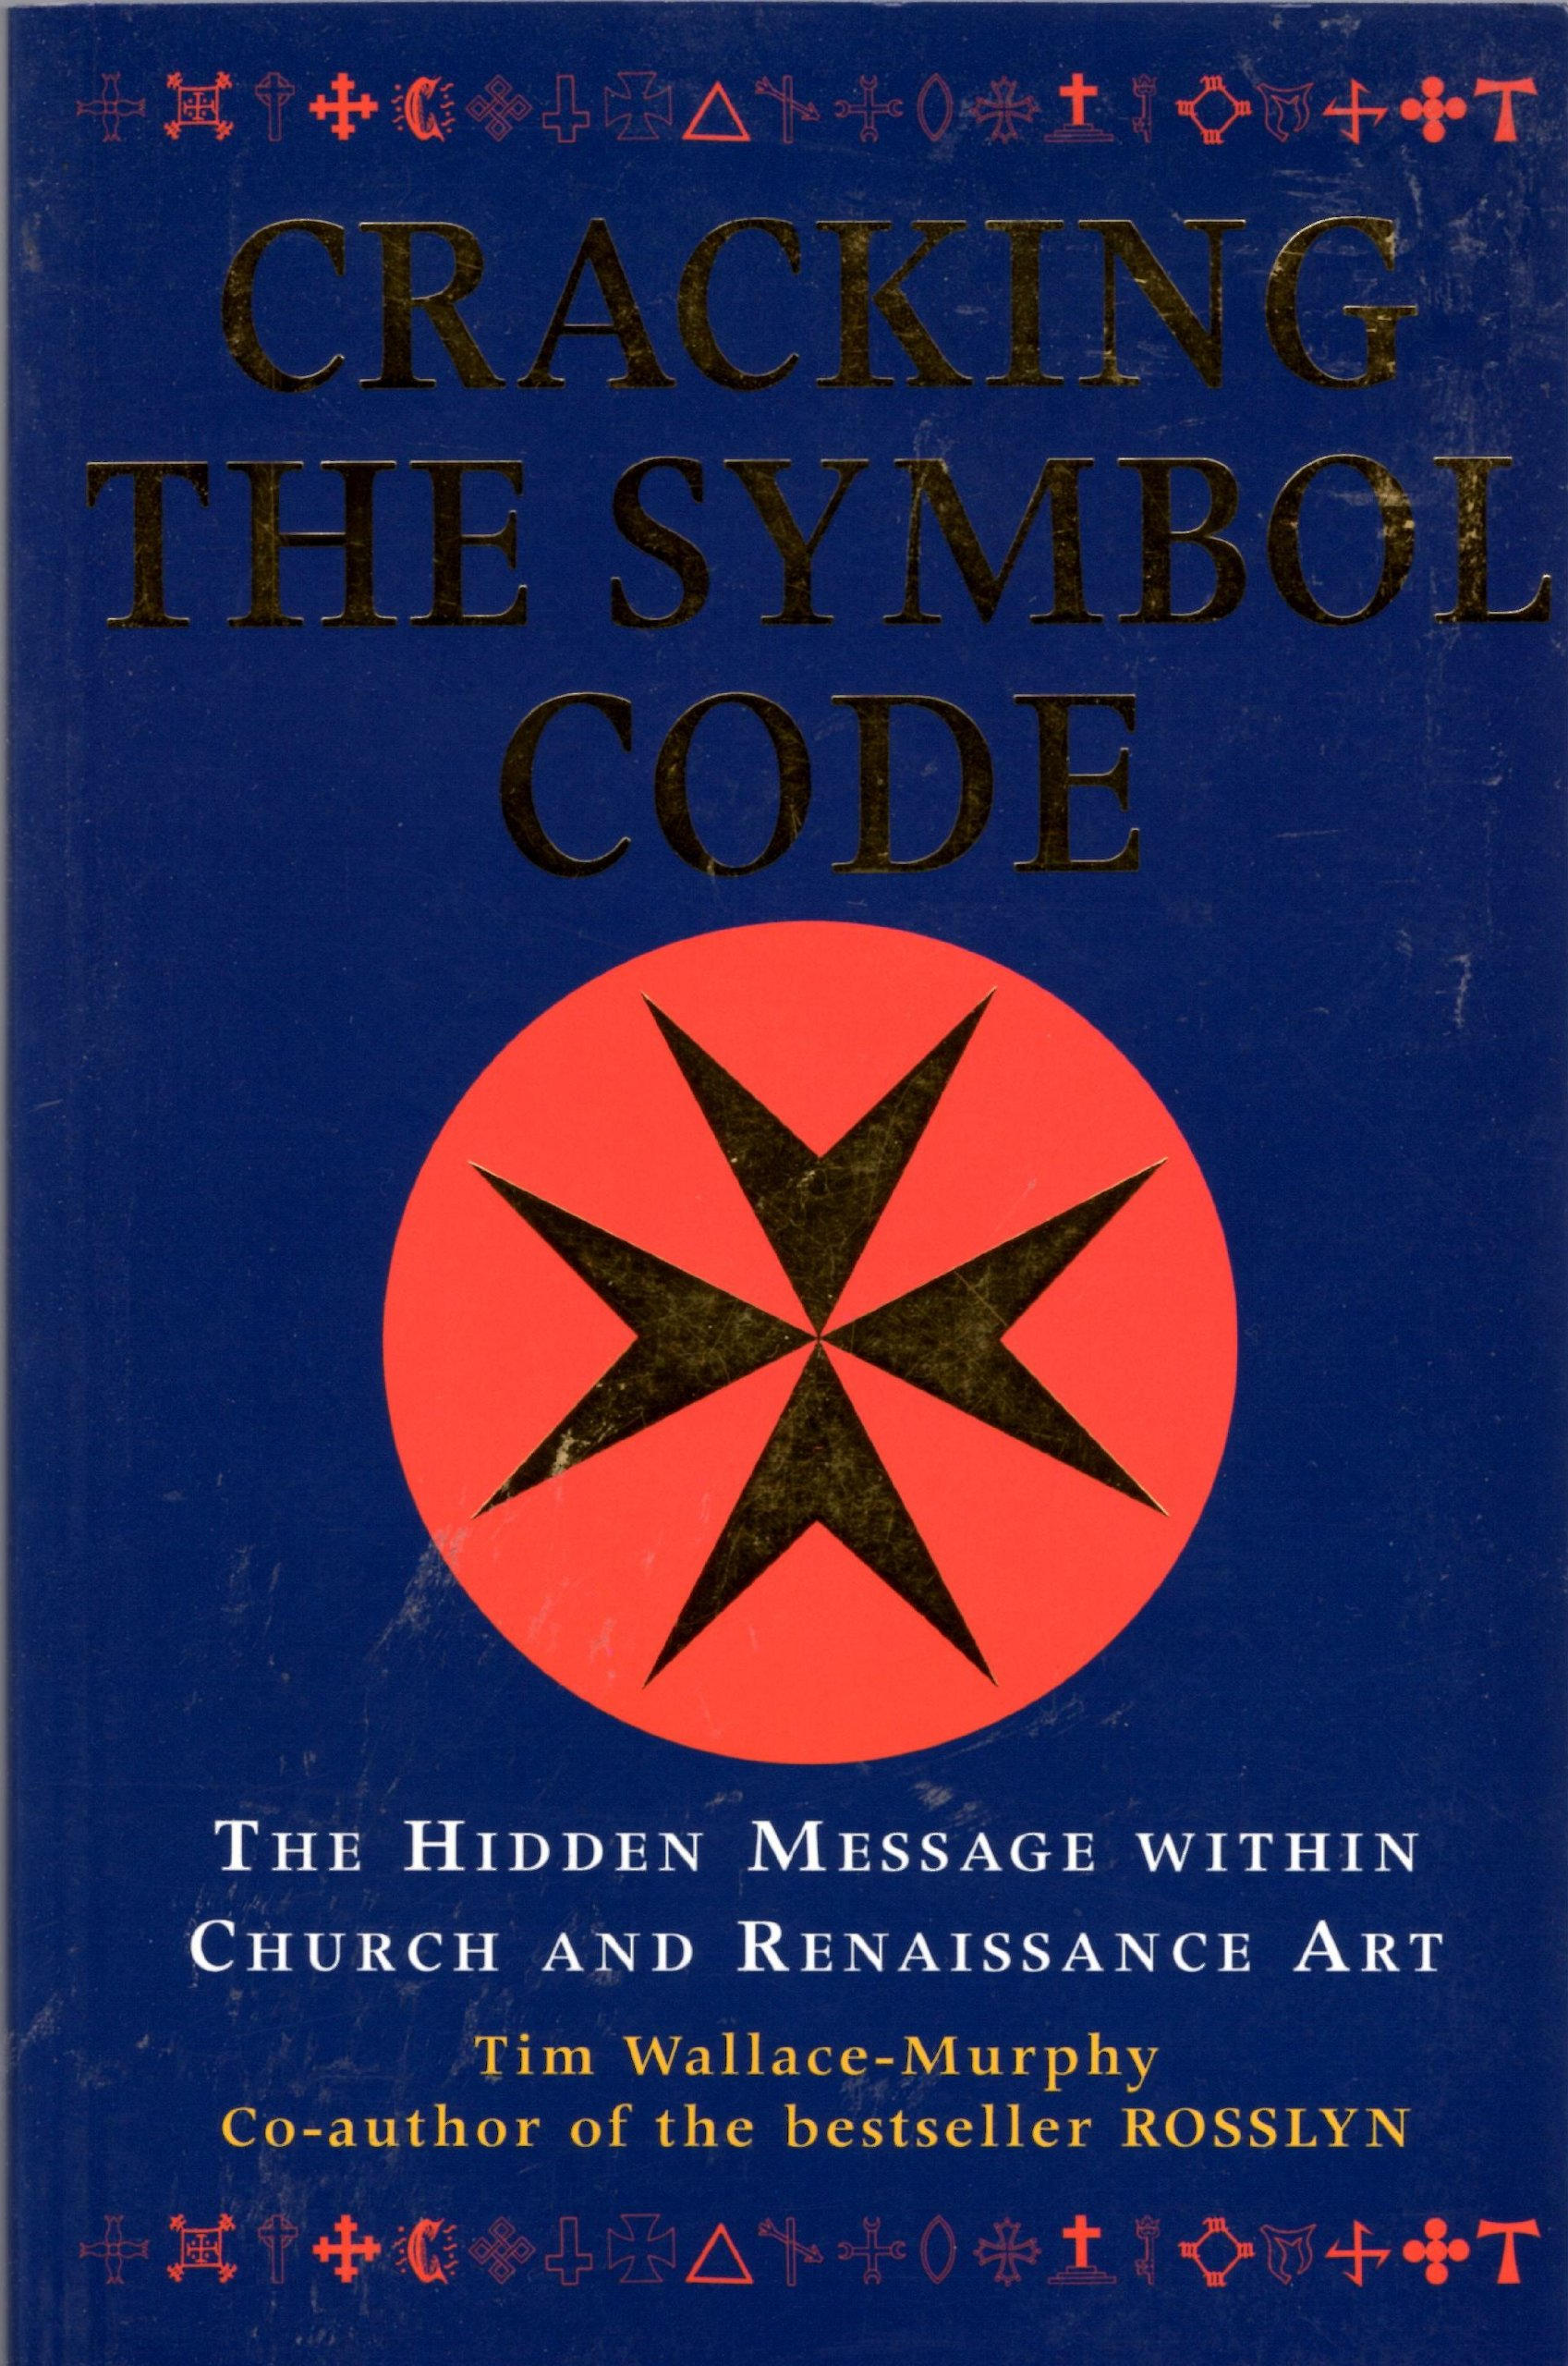 Cracking The Symbol Code Tim Wallace Murphy 9781842931592 Amazon